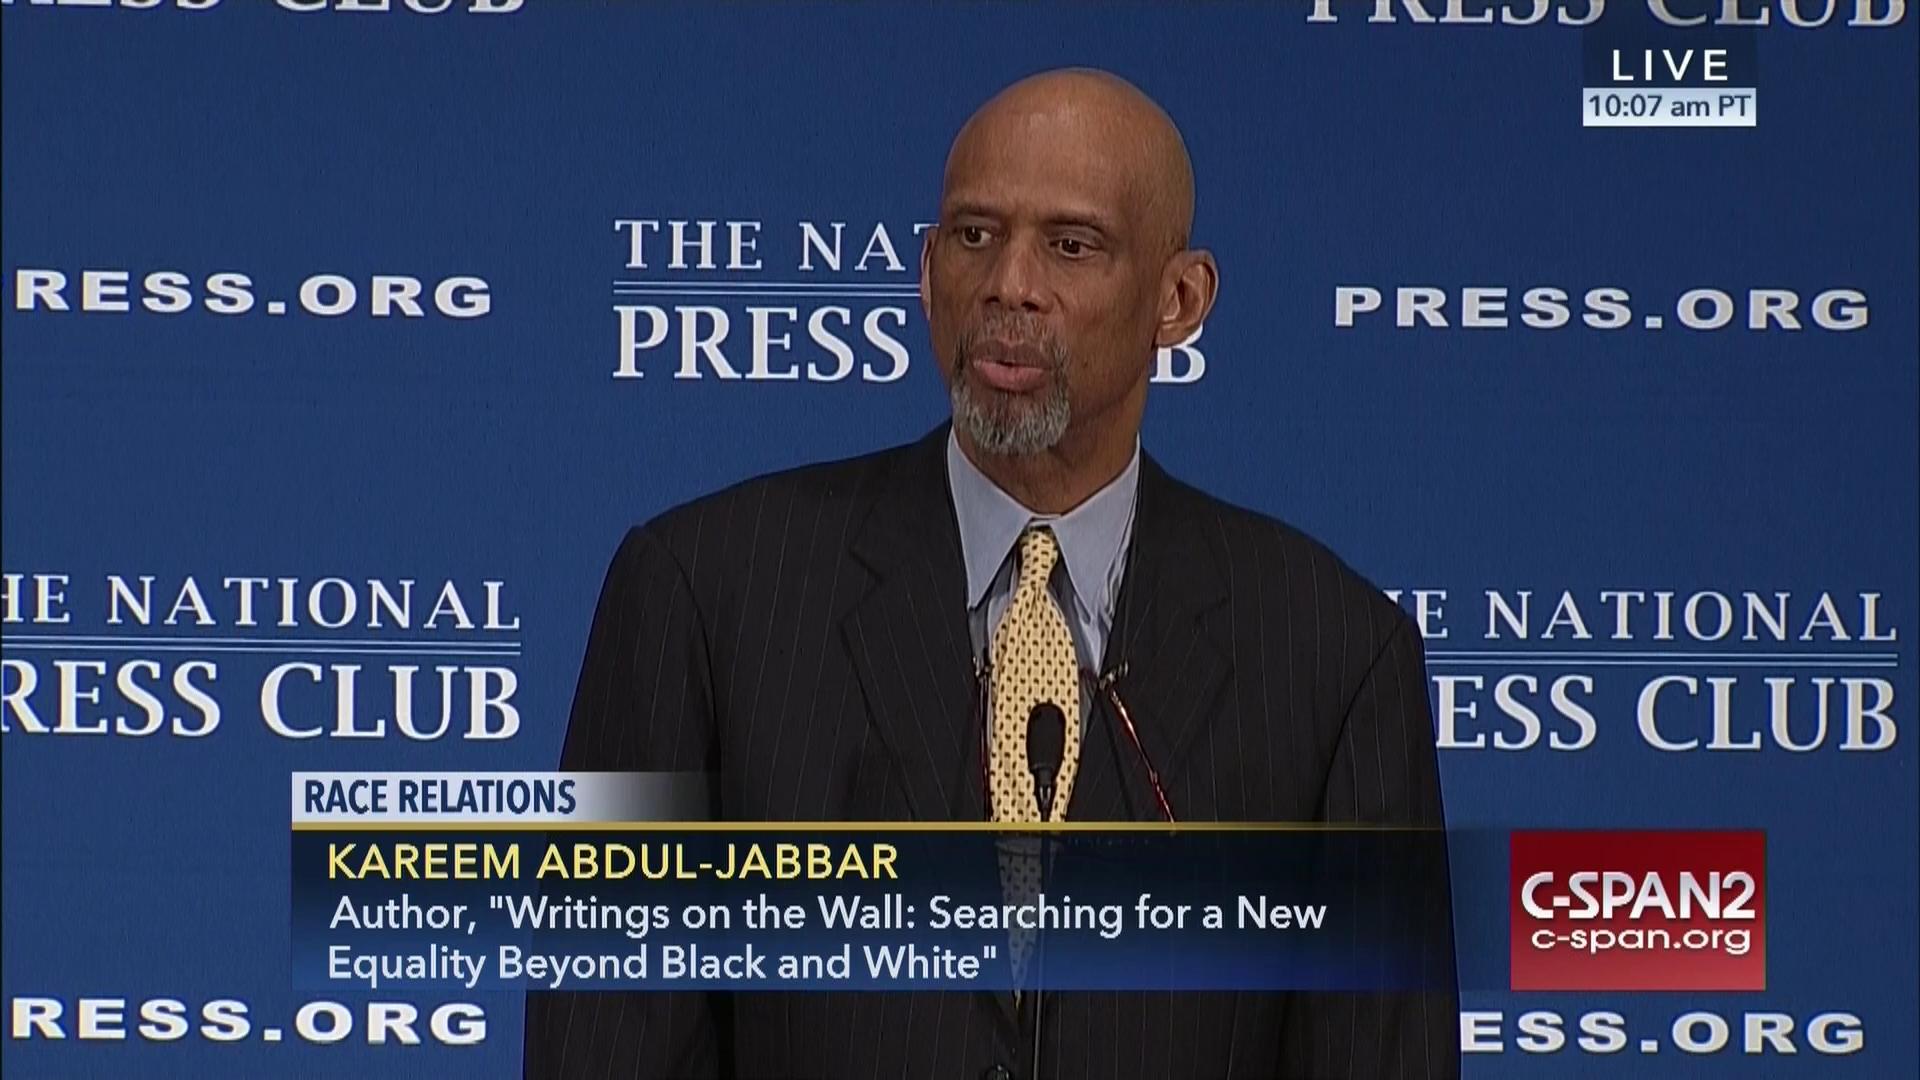 Kareem Abdul Jabbar Discusses Writings Wall, Oct 17 2016 | Video |  C-SPAN.org